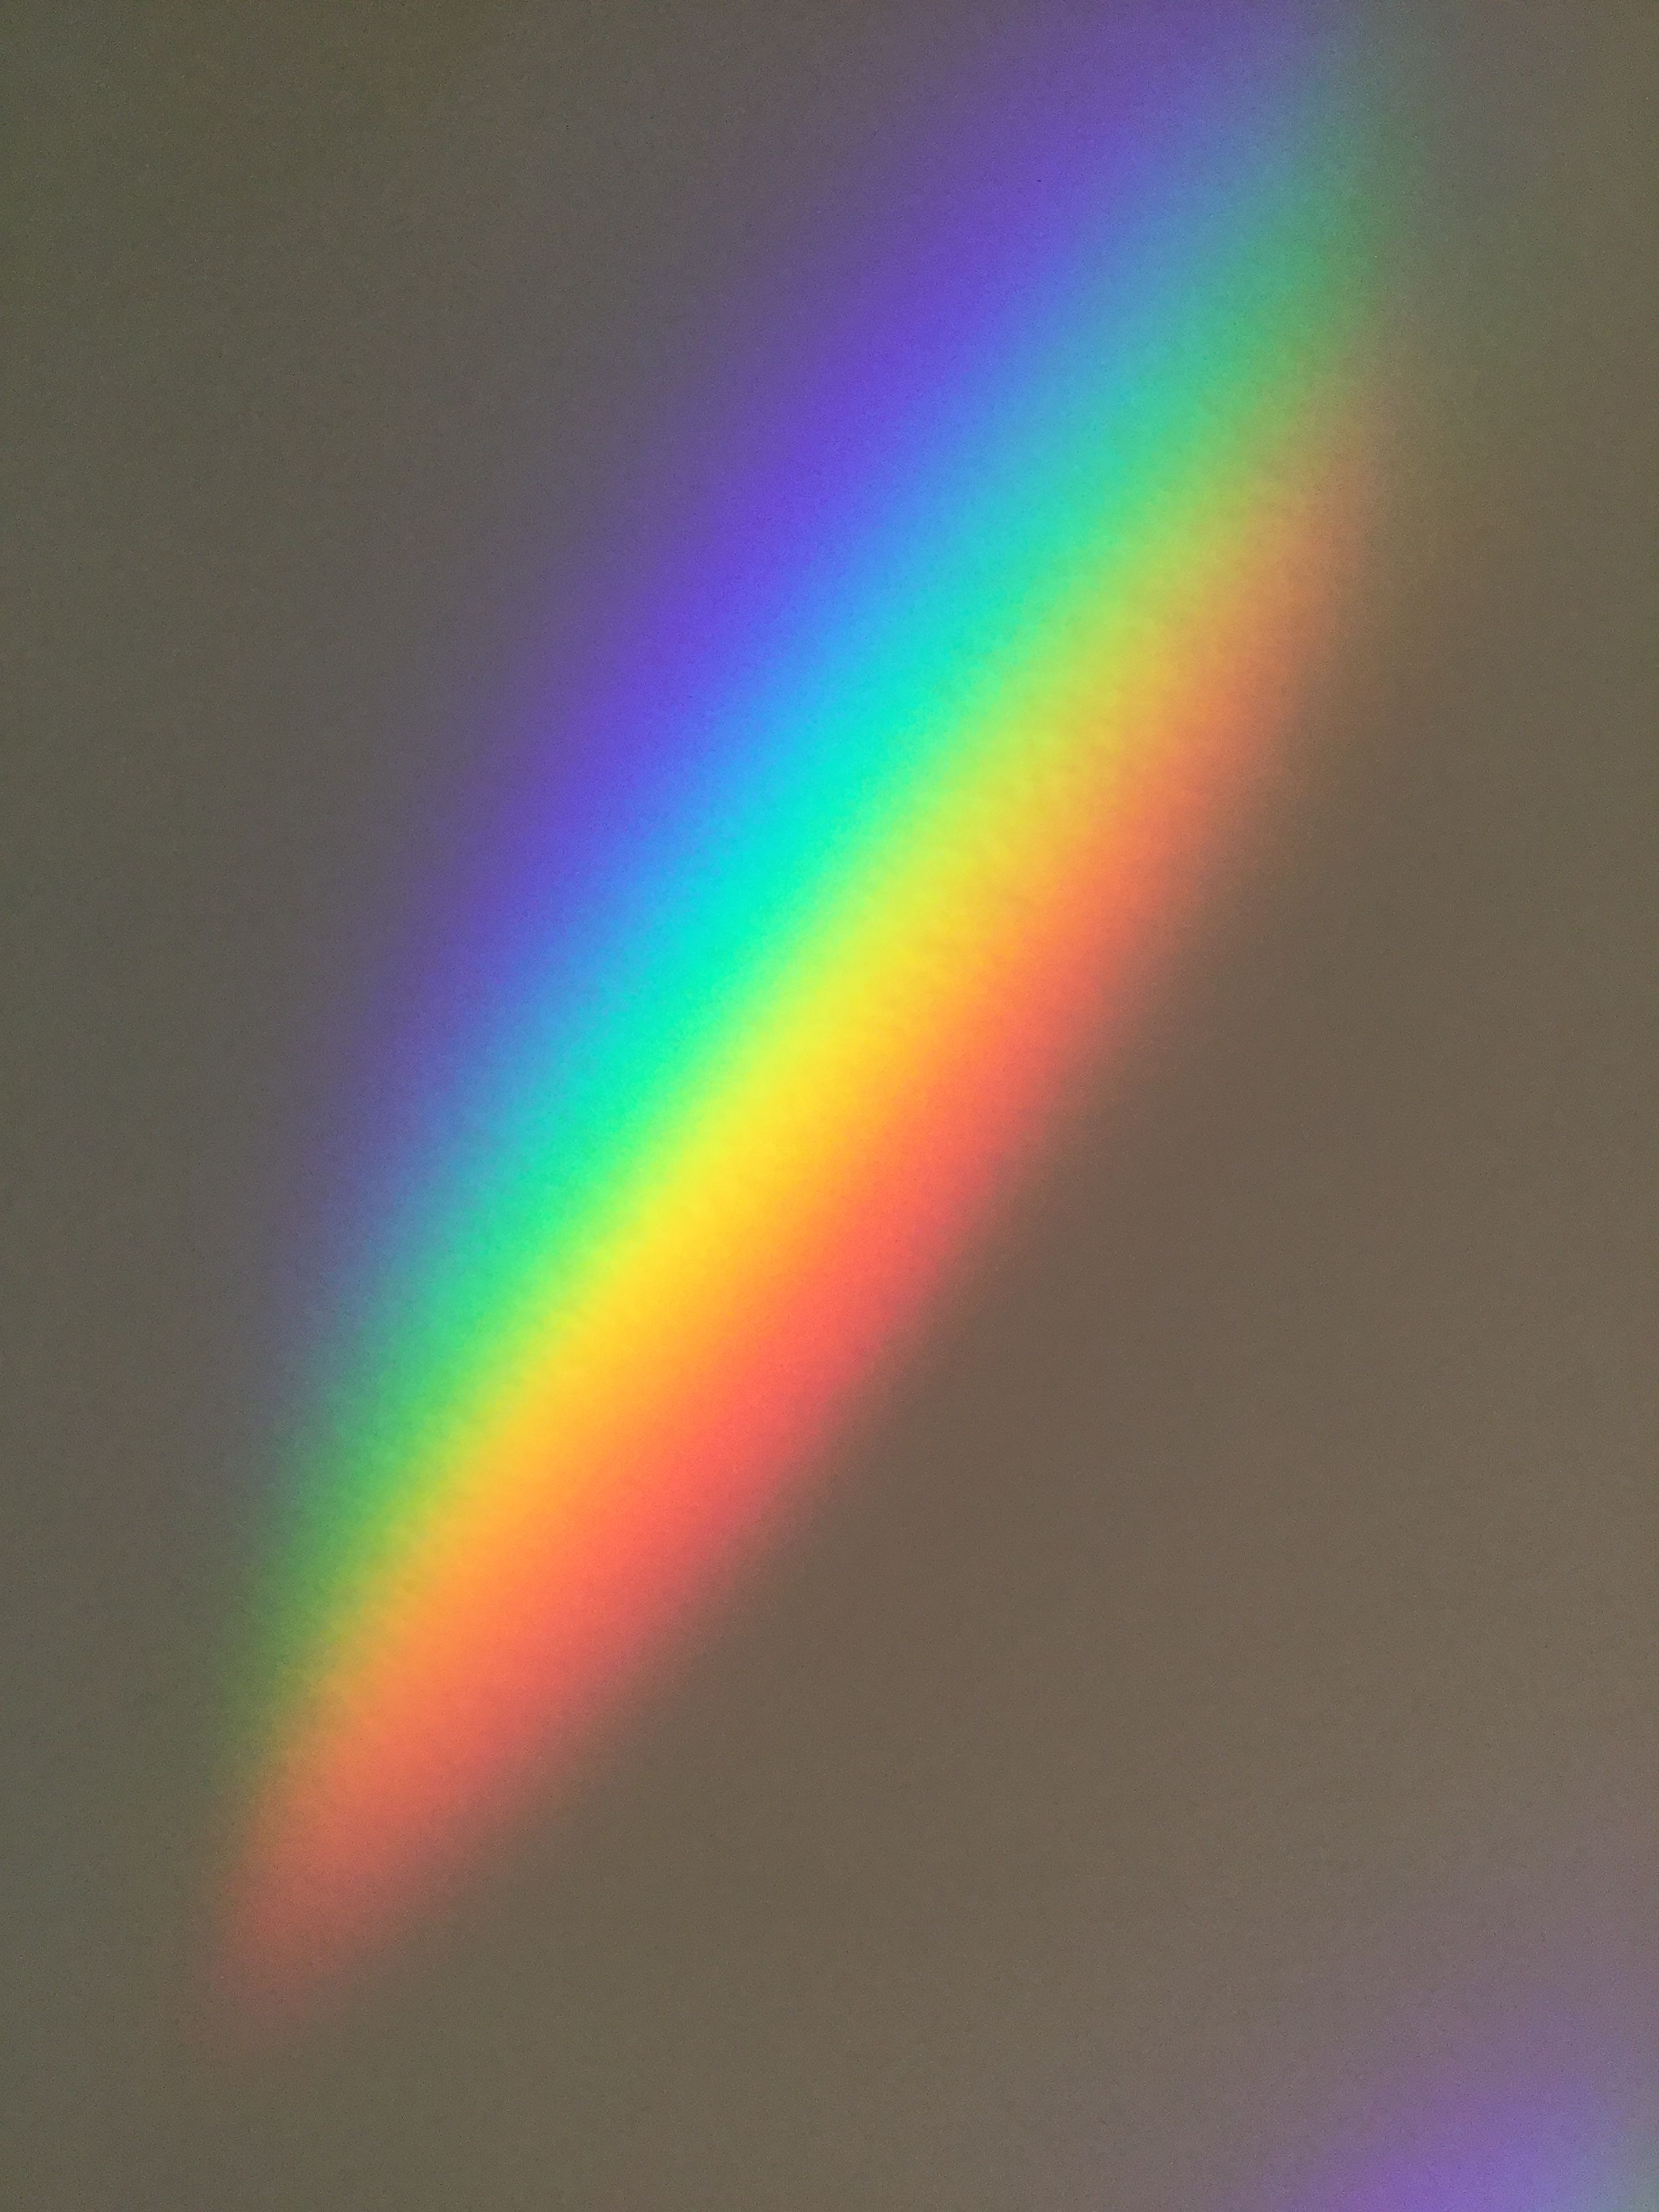 Pin By Jesus Himself On Photography Rainbow Aesthetic Rainbow